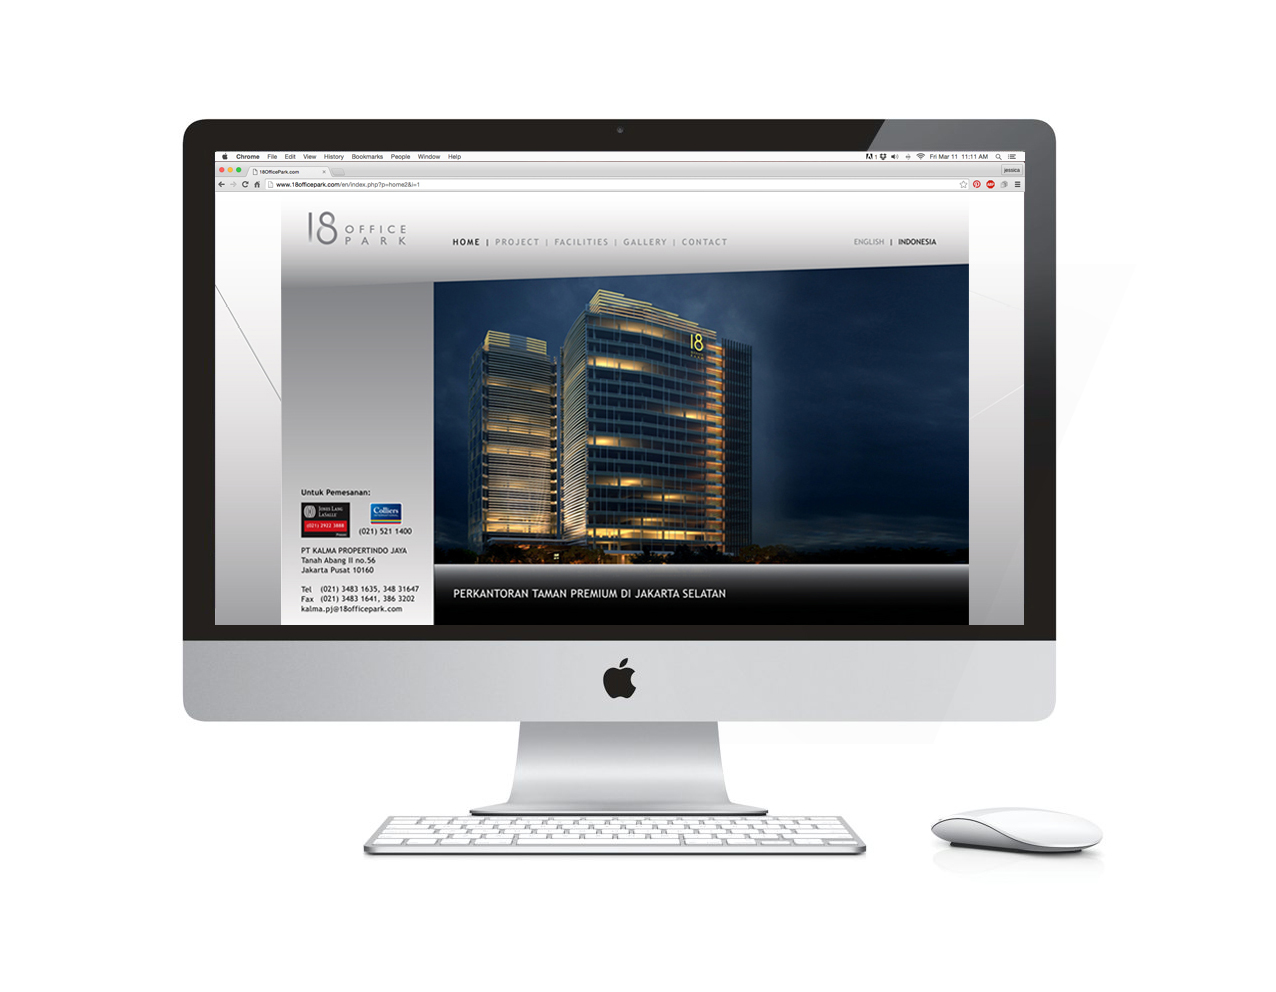 18Office Park_Website_2.jpg